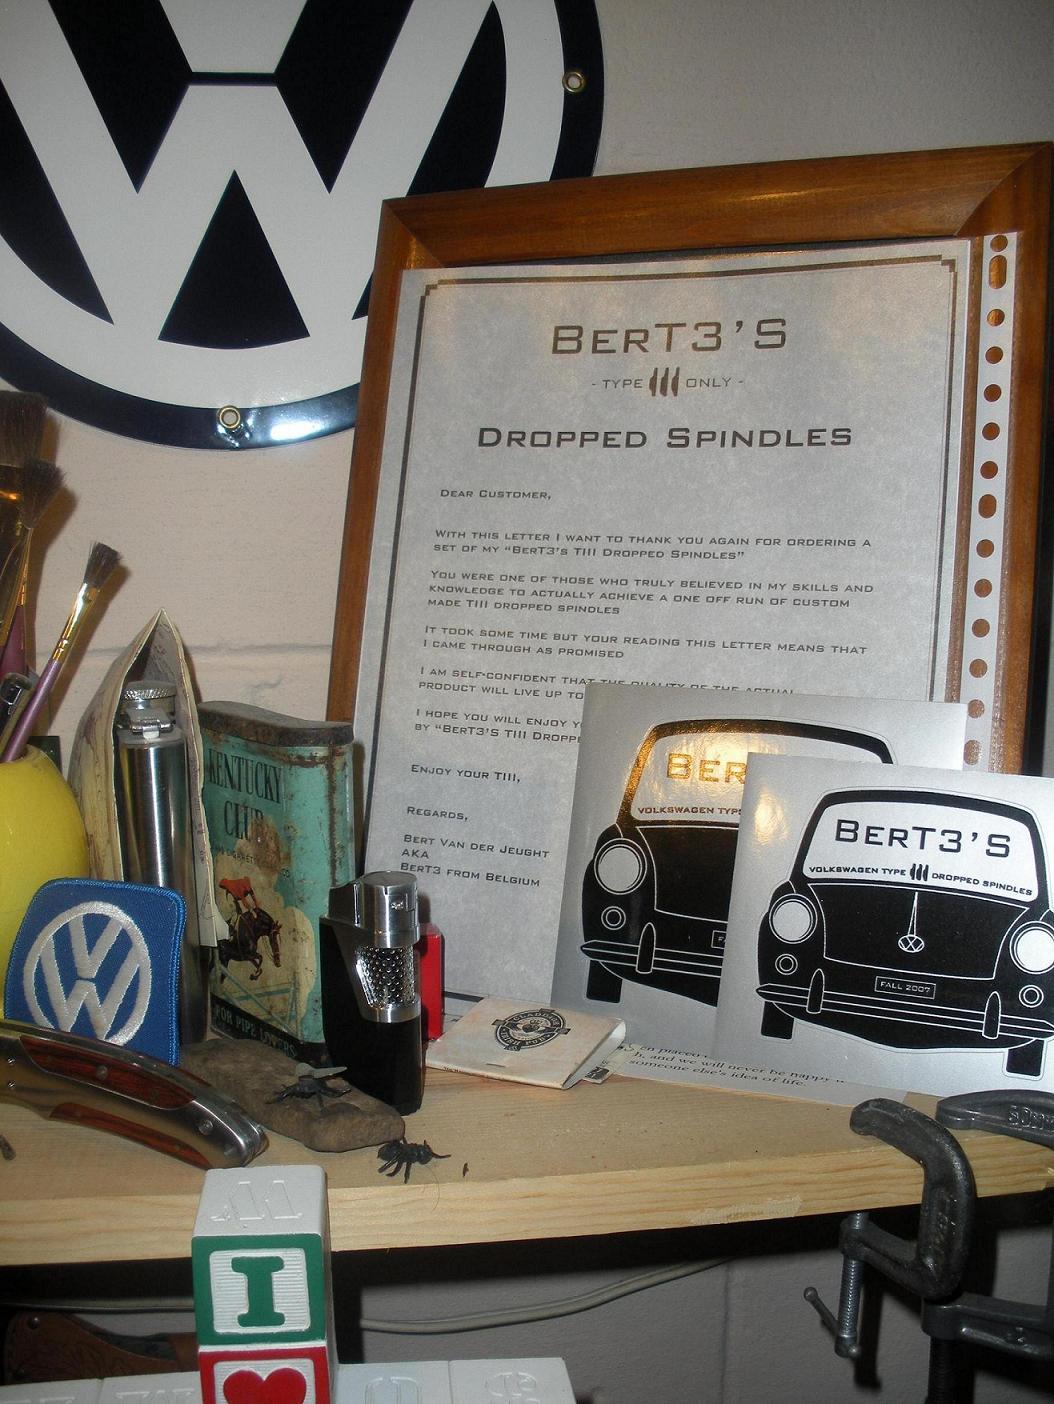 My BerT3 Spindles